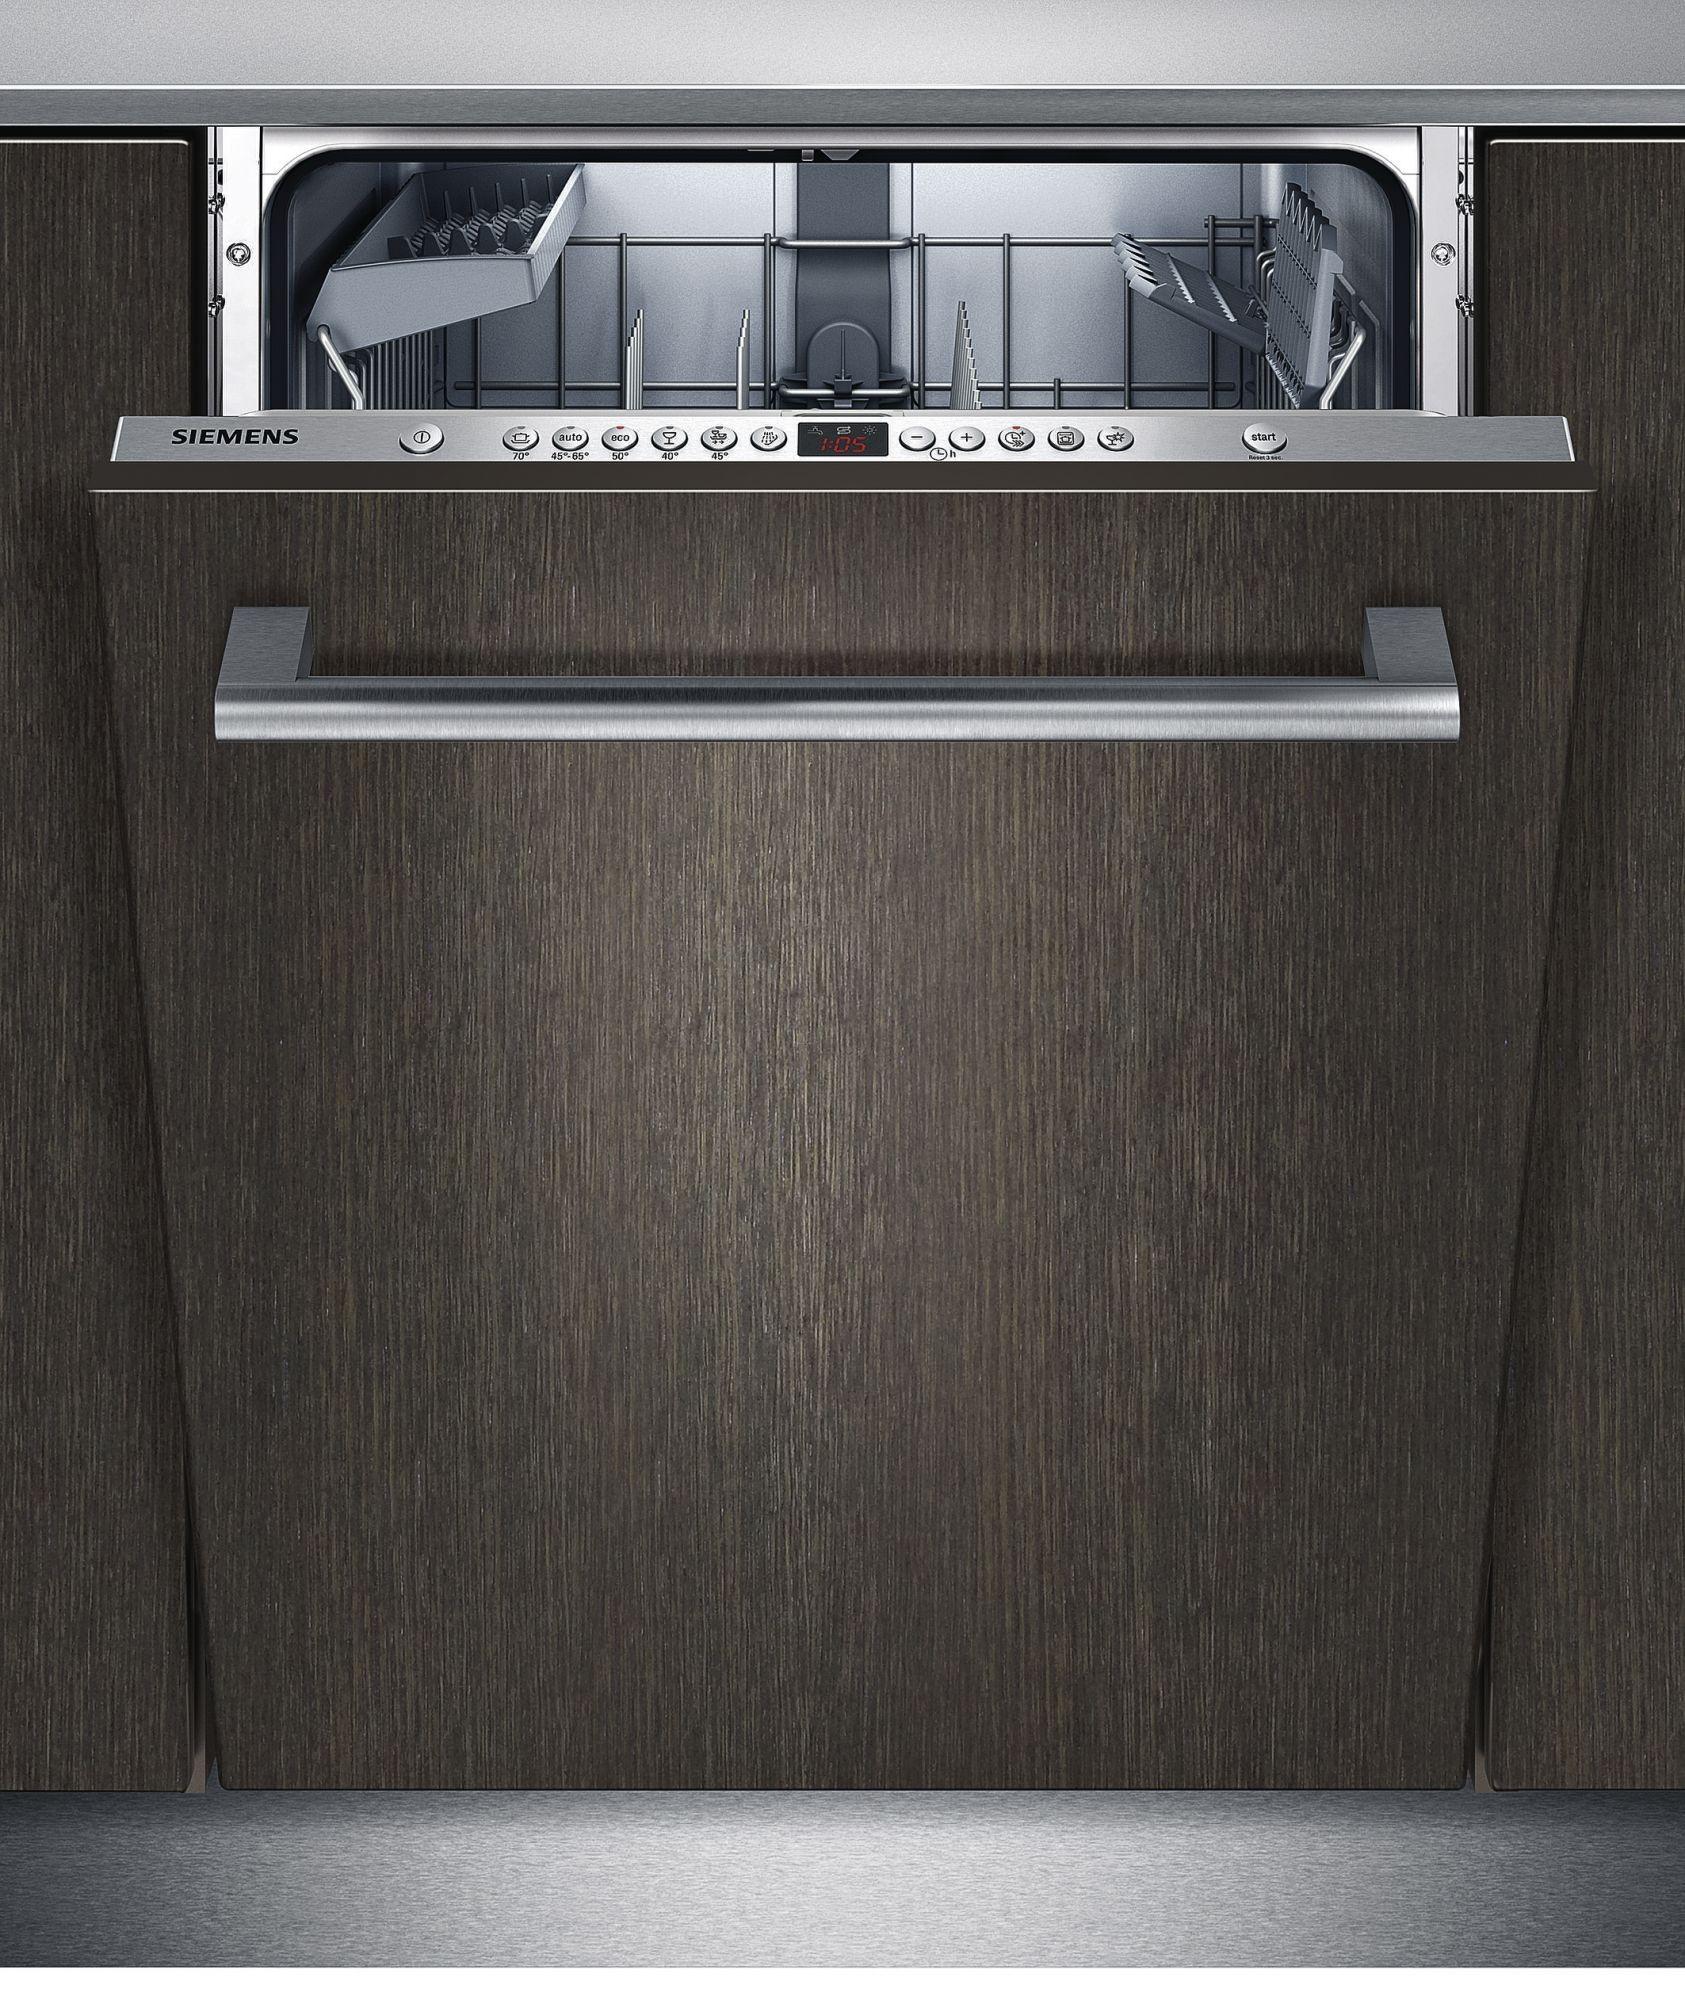 teamsix sx66p032eu siemens elektro gro einbau geschirrsp ler vollintegrierbar. Black Bedroom Furniture Sets. Home Design Ideas